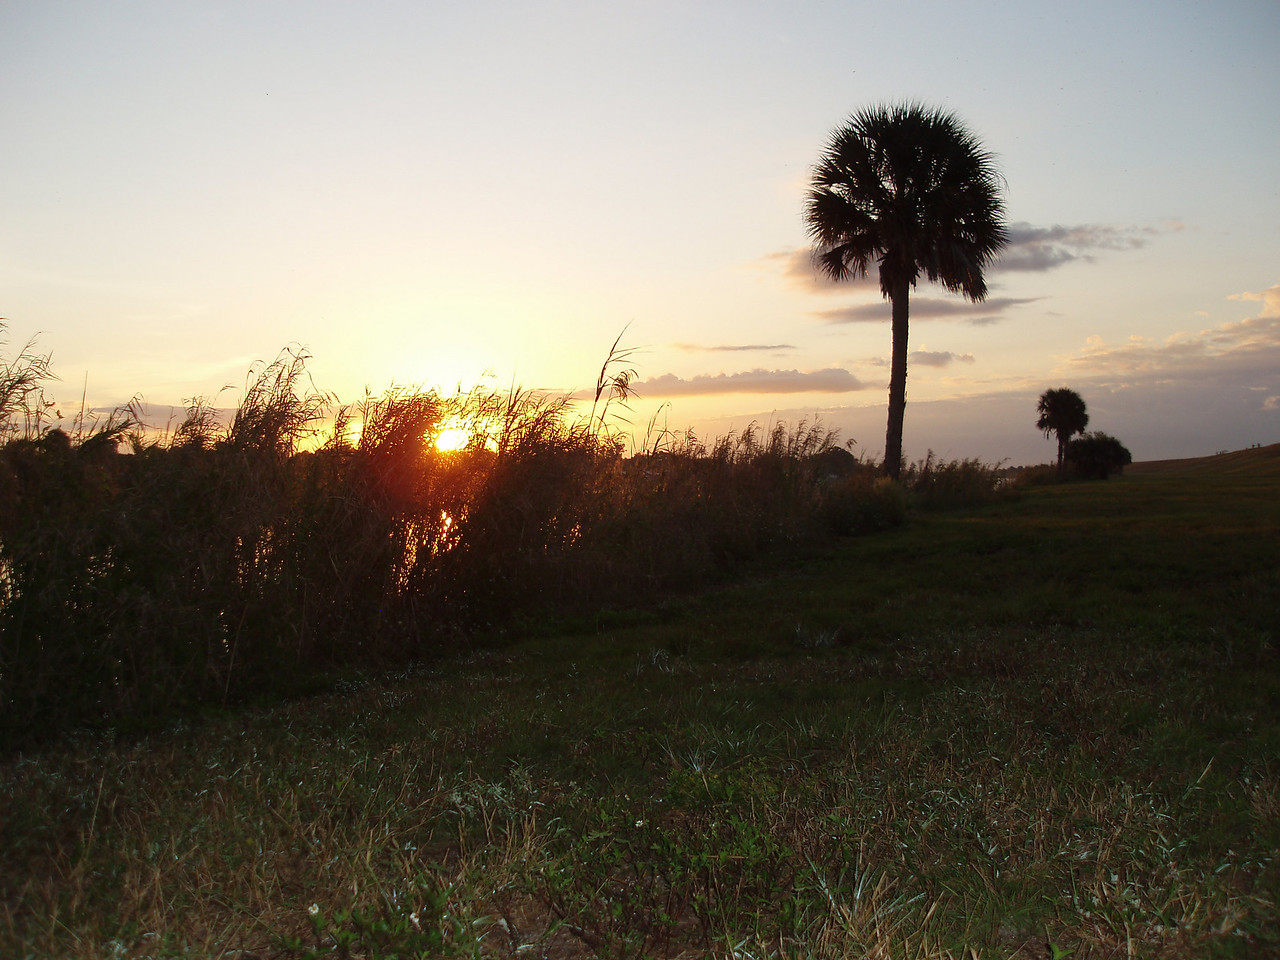 Sunrise along the Rim Canal<br /> PHOTO CREDIT: Robert Coveney / Florida Trail Association